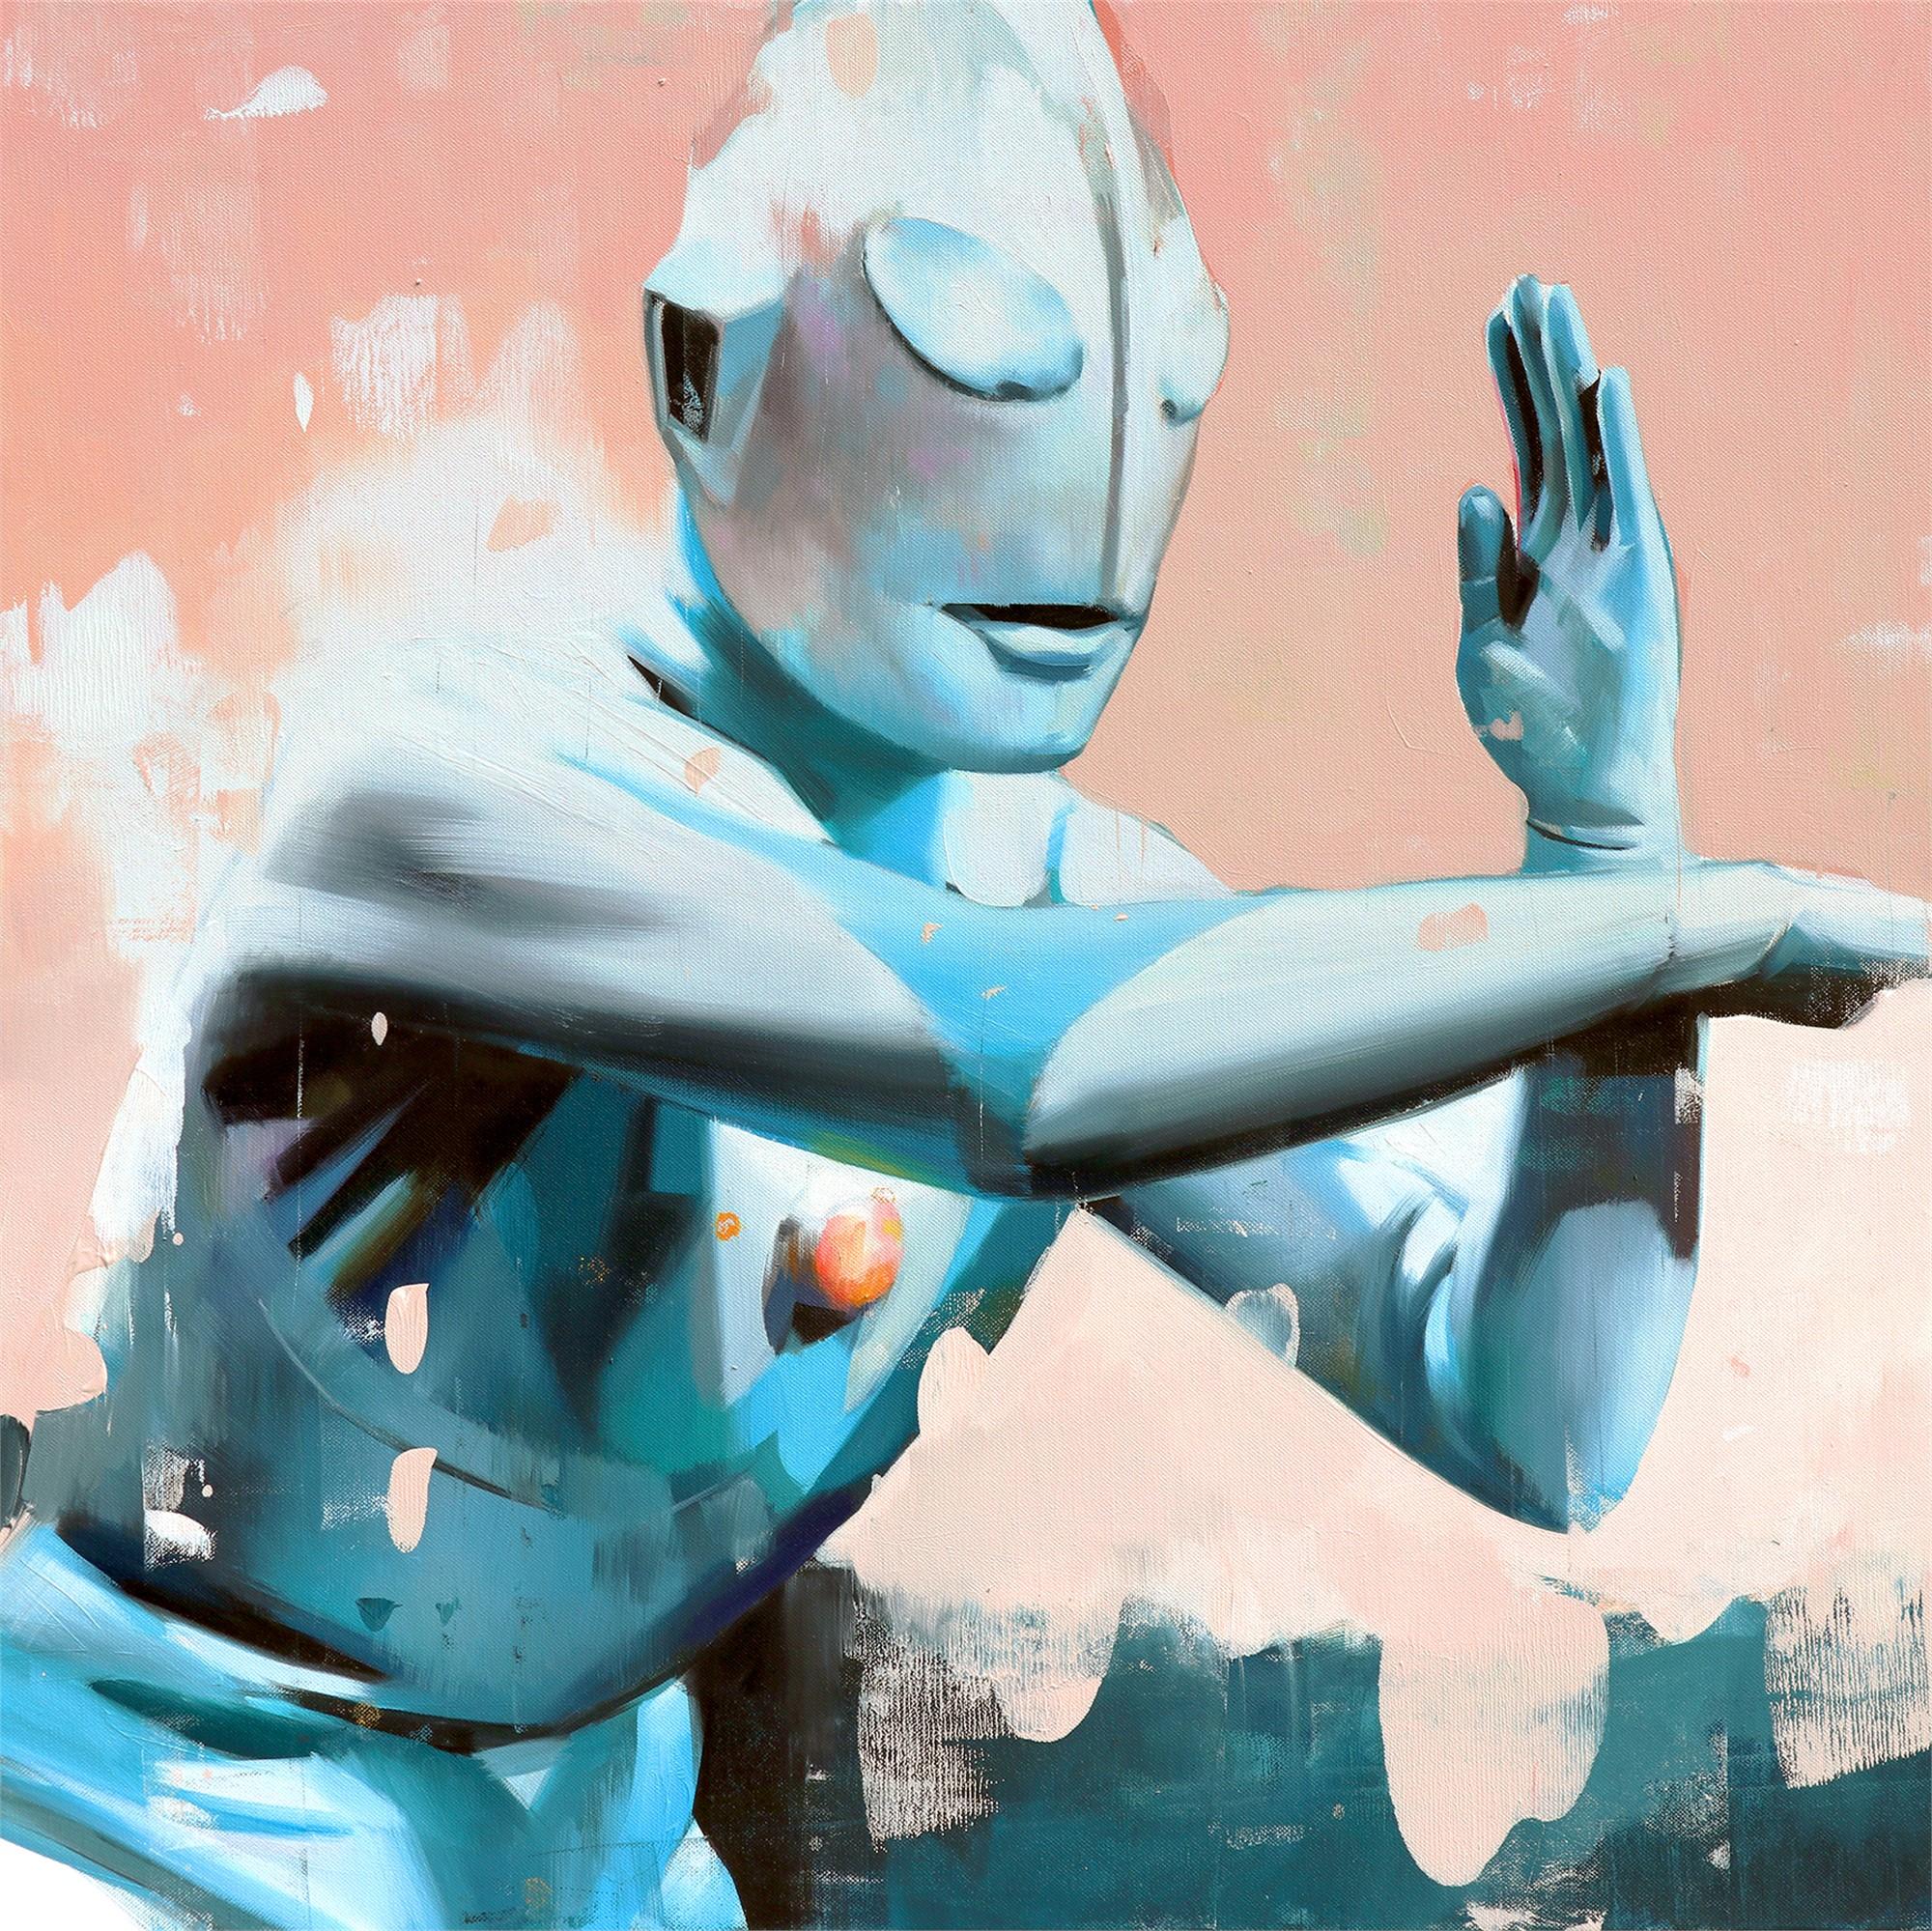 Ultraman by Alpay Efe